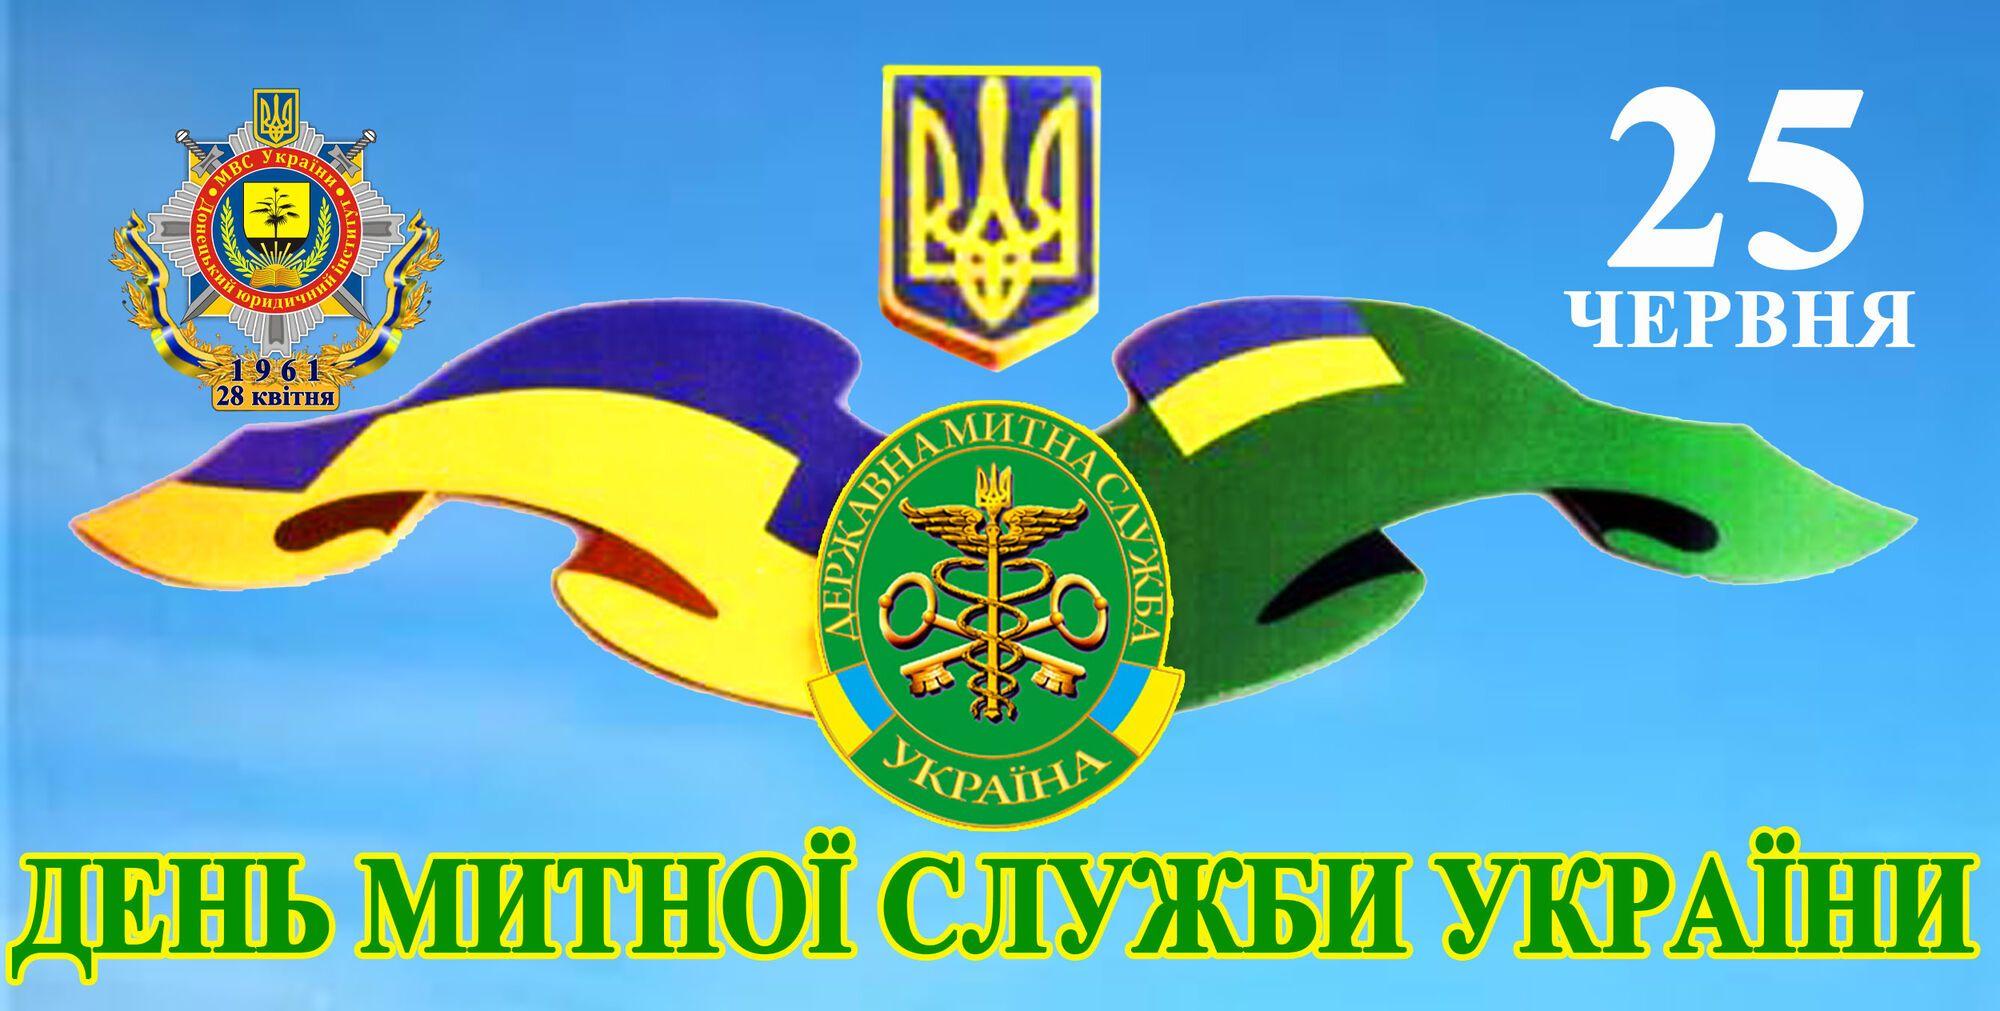 Картинки до Дня митної служби України